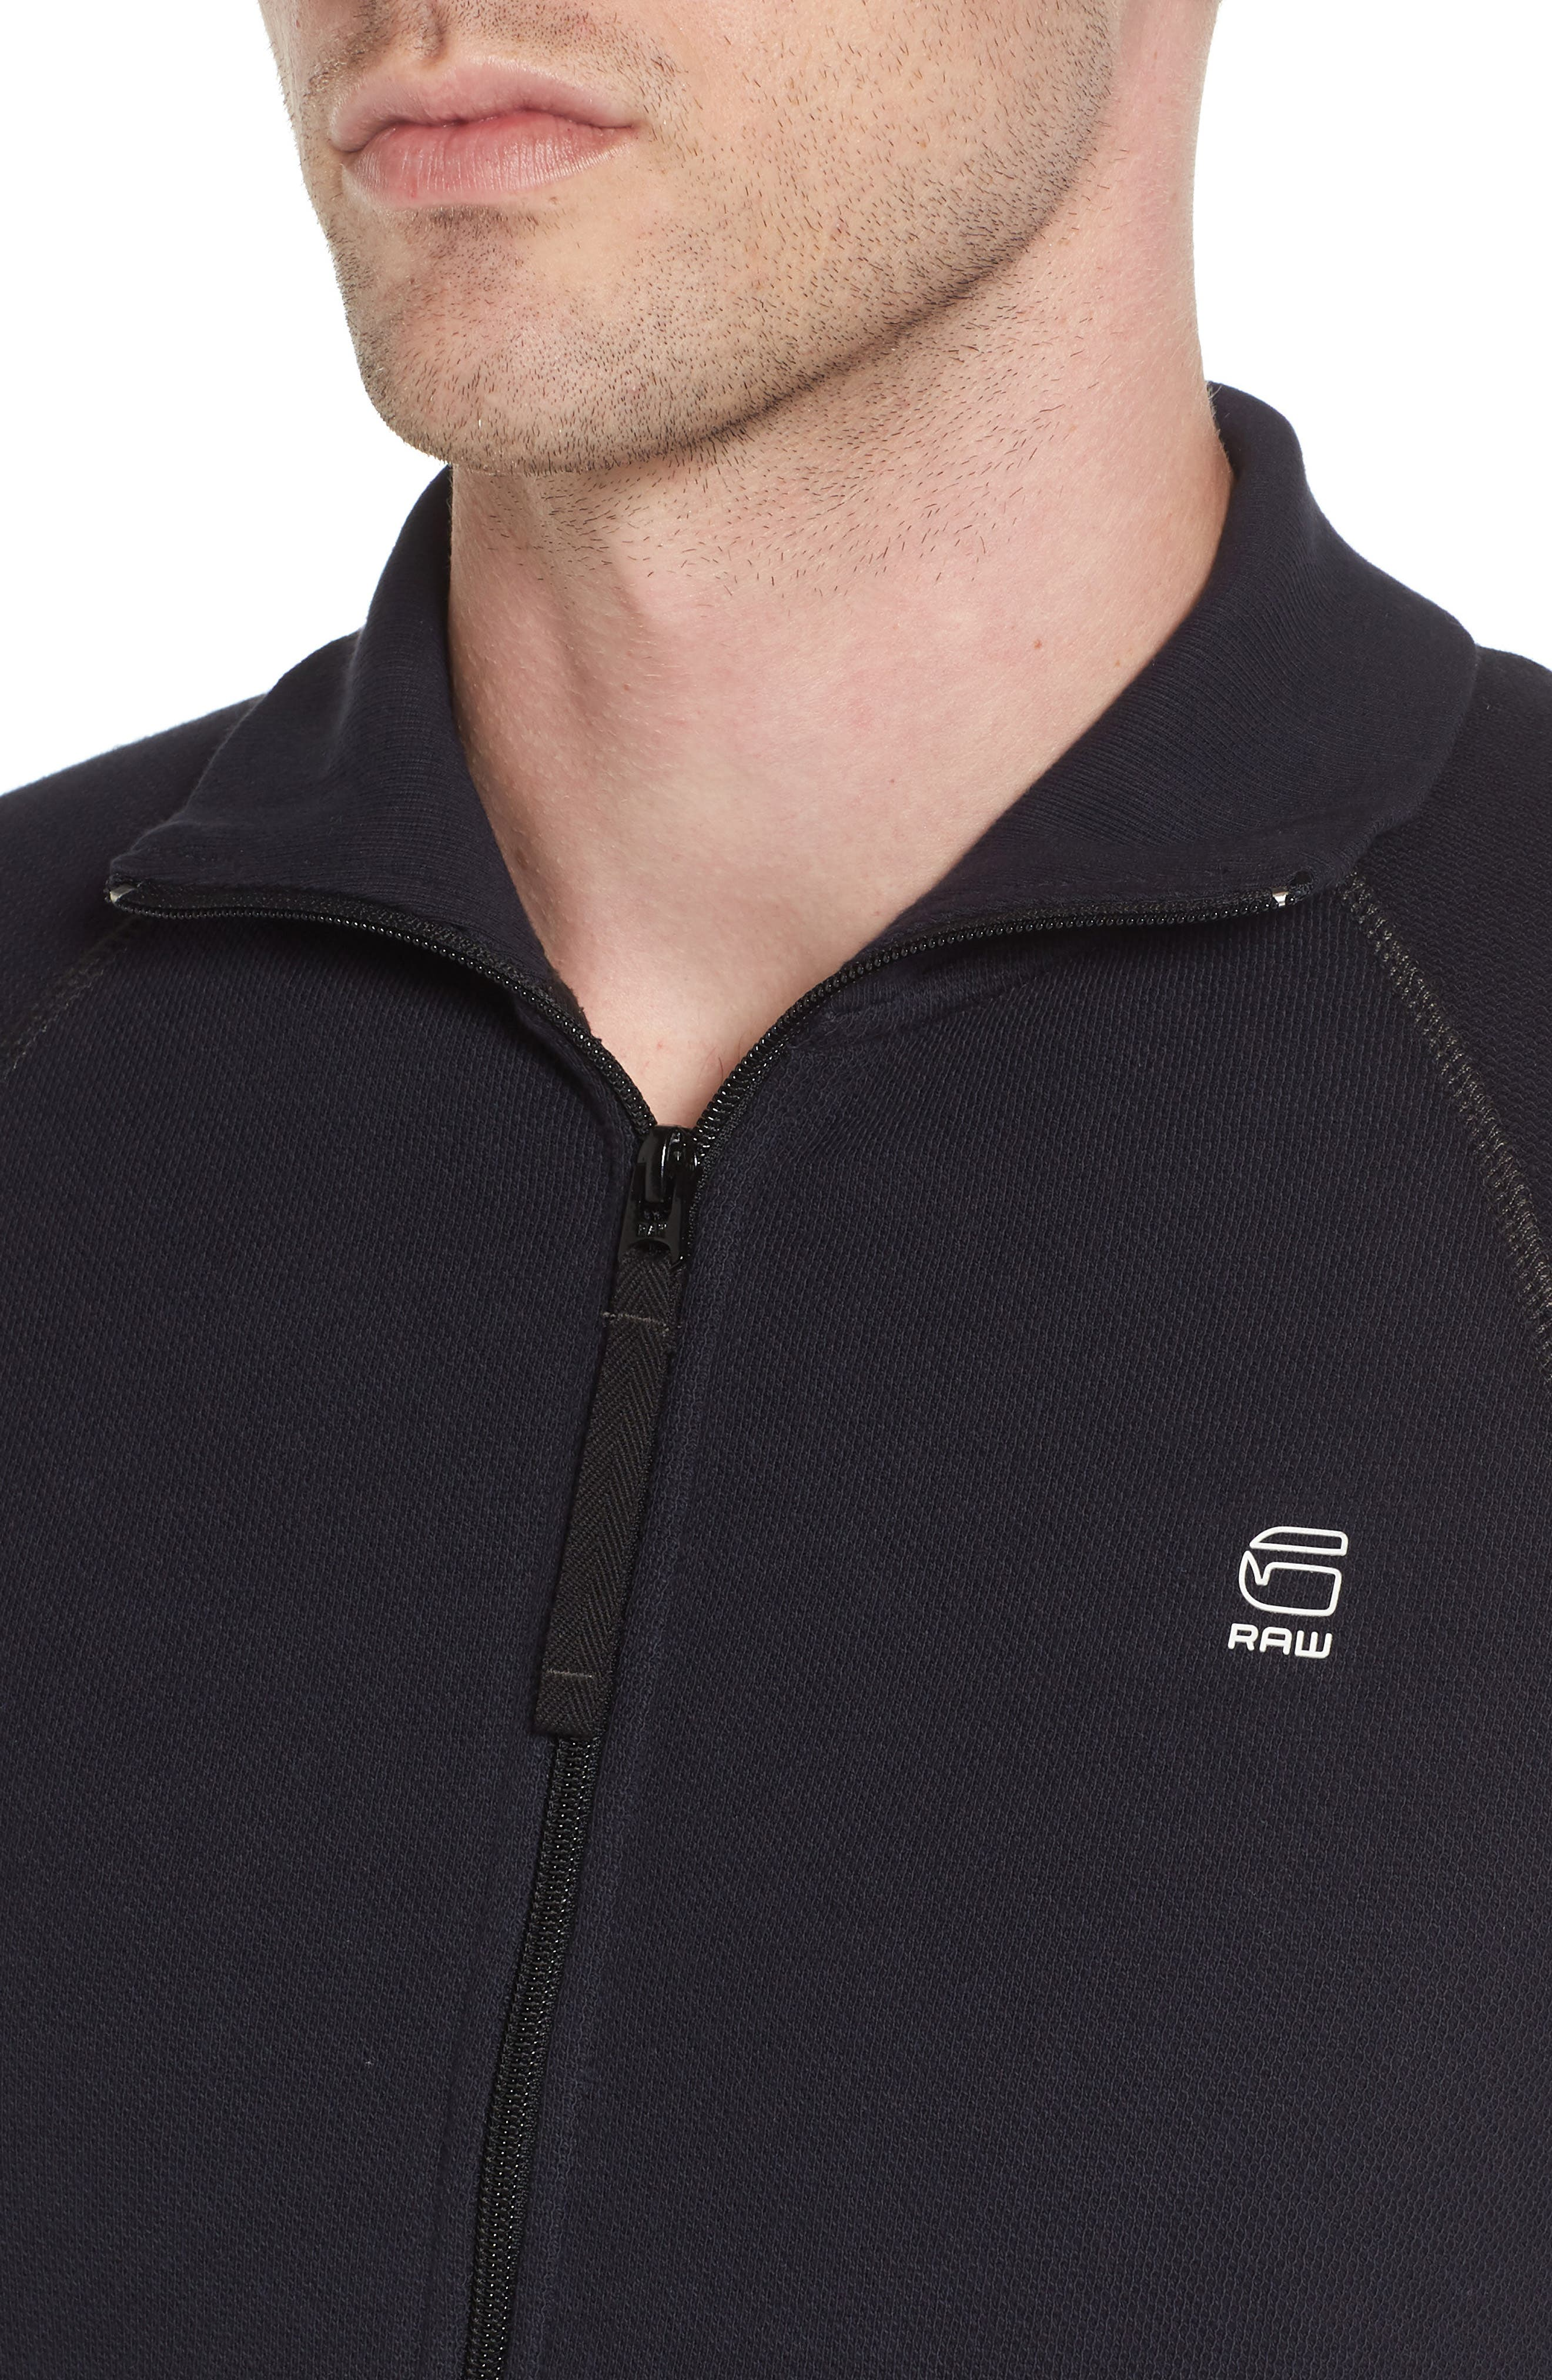 Jirgi Front Zip Sweater,                             Alternate thumbnail 4, color,                             400